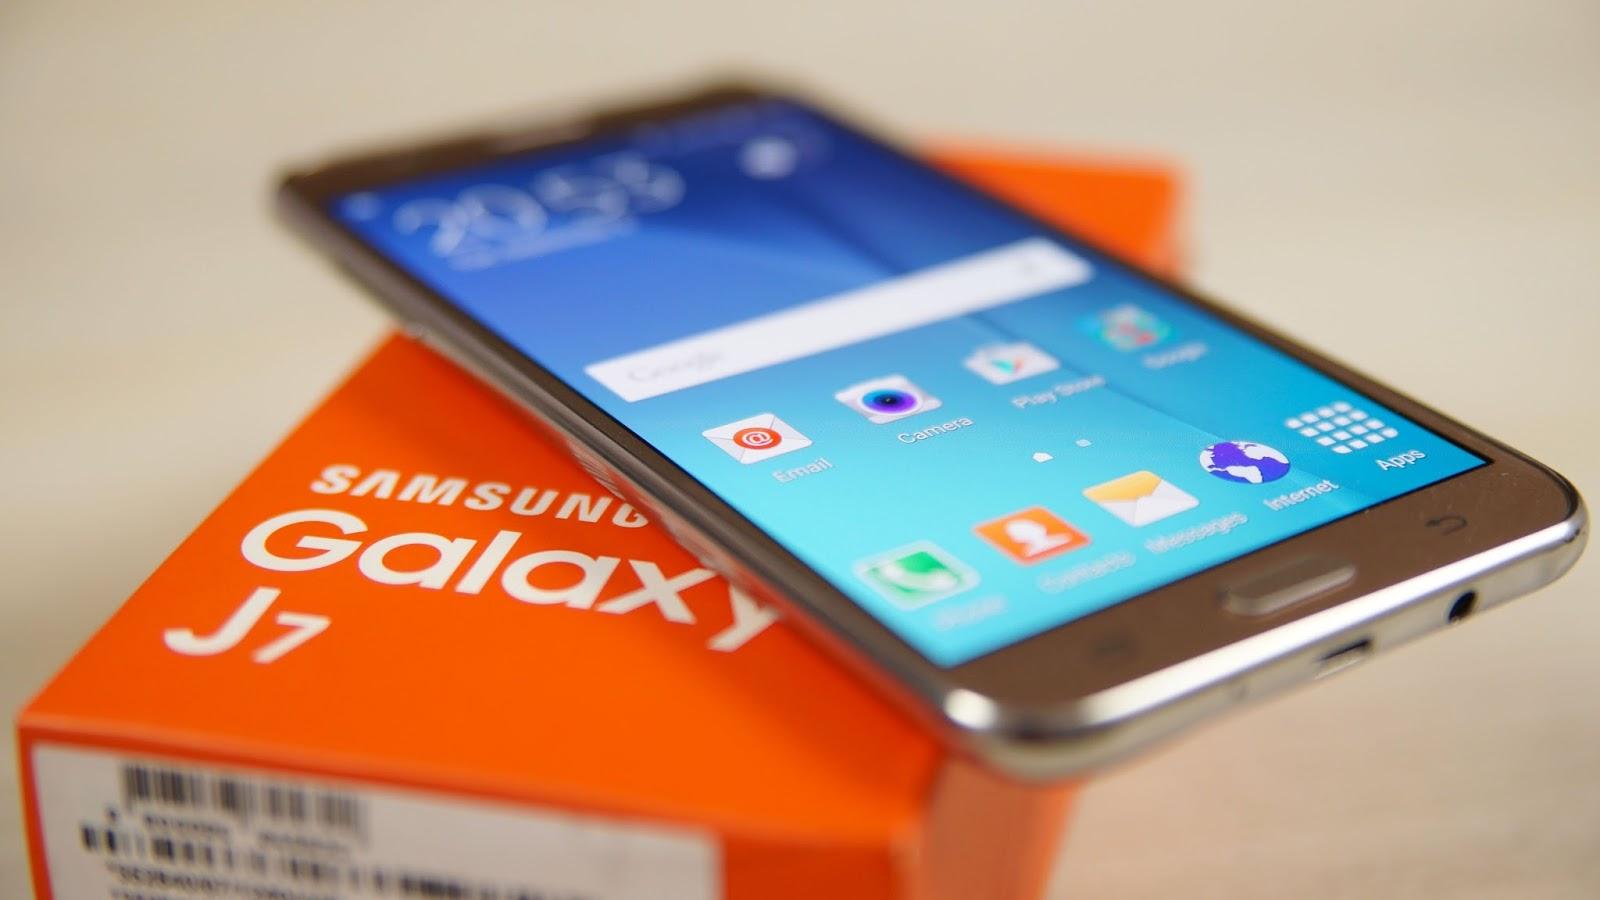 Bypass Samsung Galaxy J7 Google Account 100% working